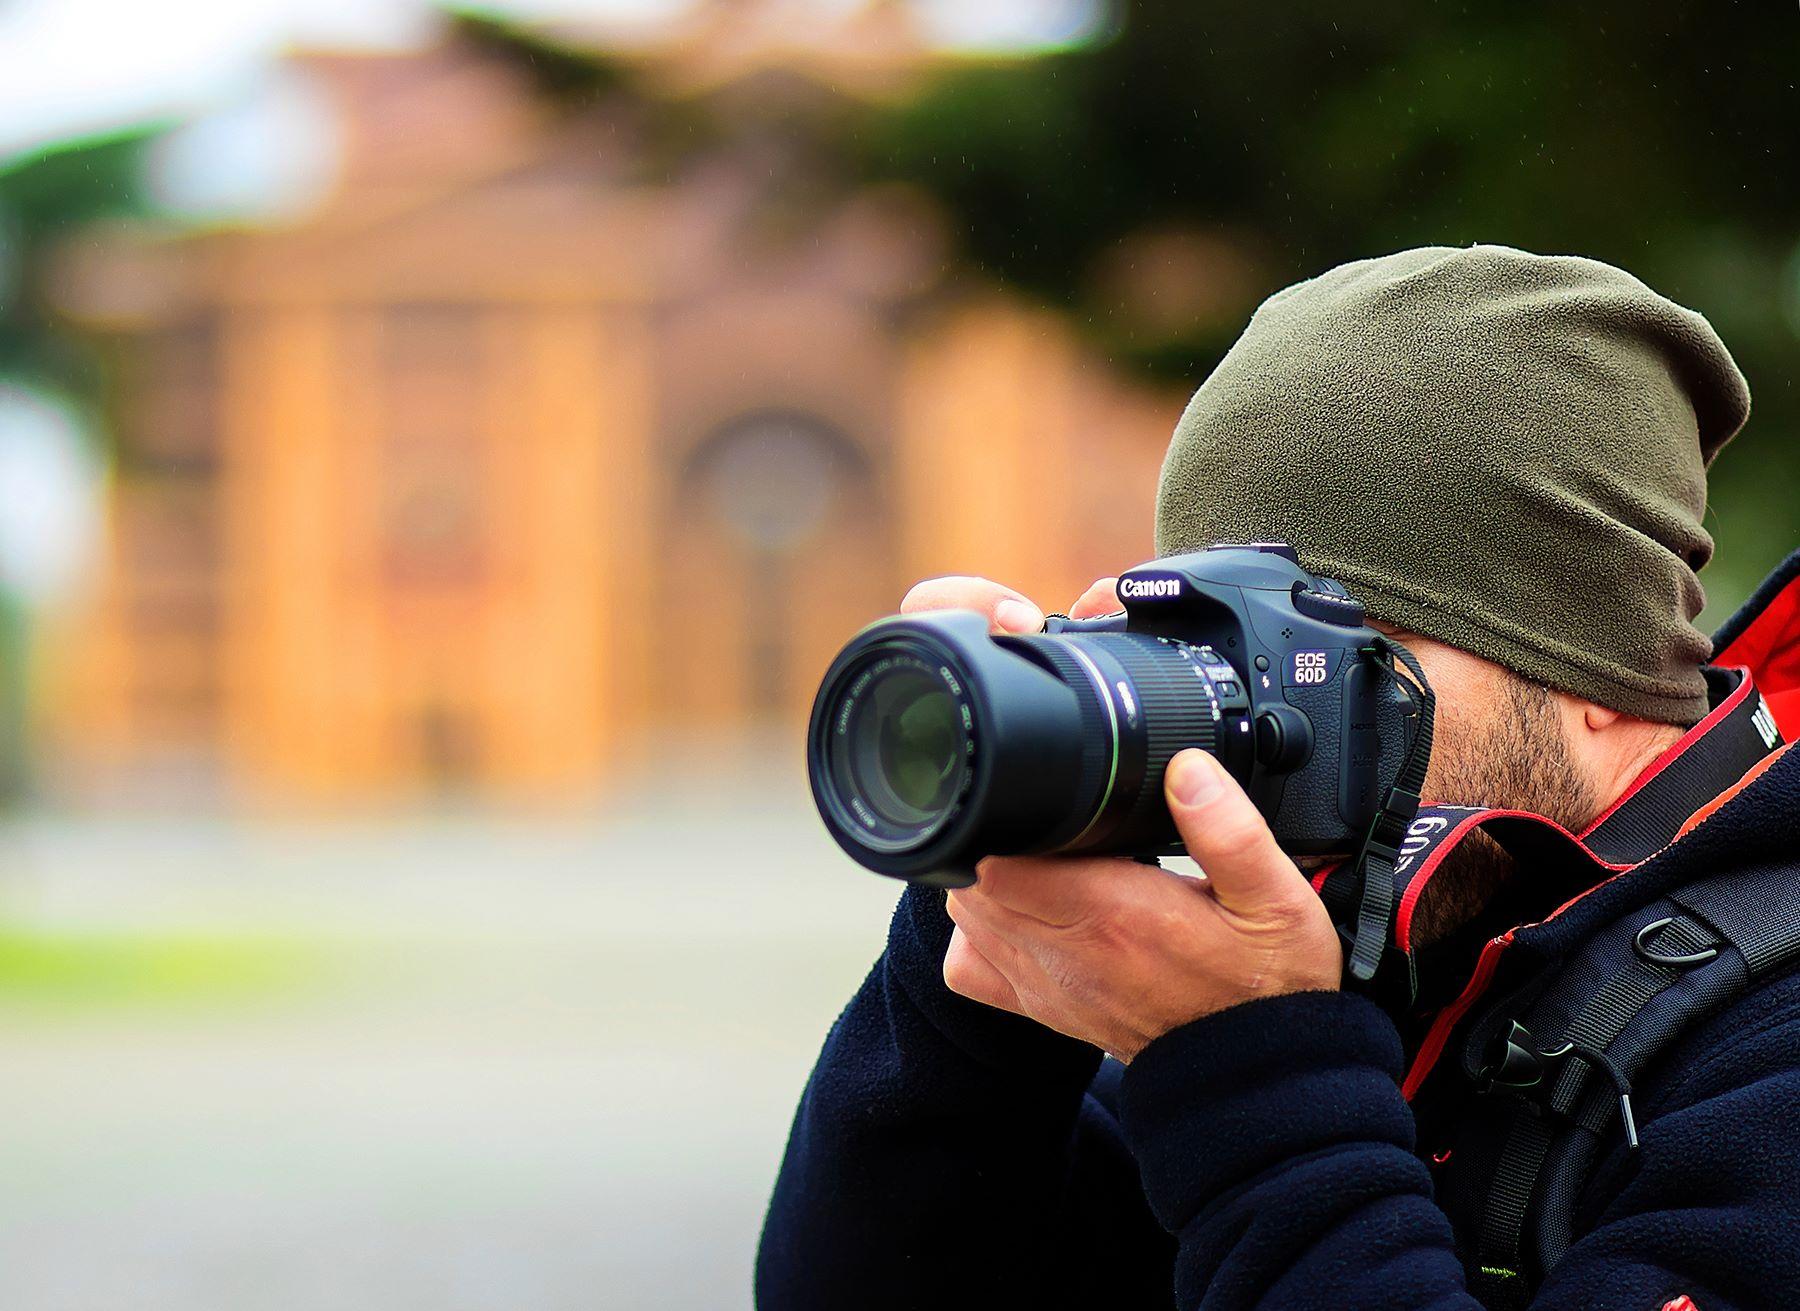 petroti Canon EF-S 55-250mm f/4-5.6 IS II Lens